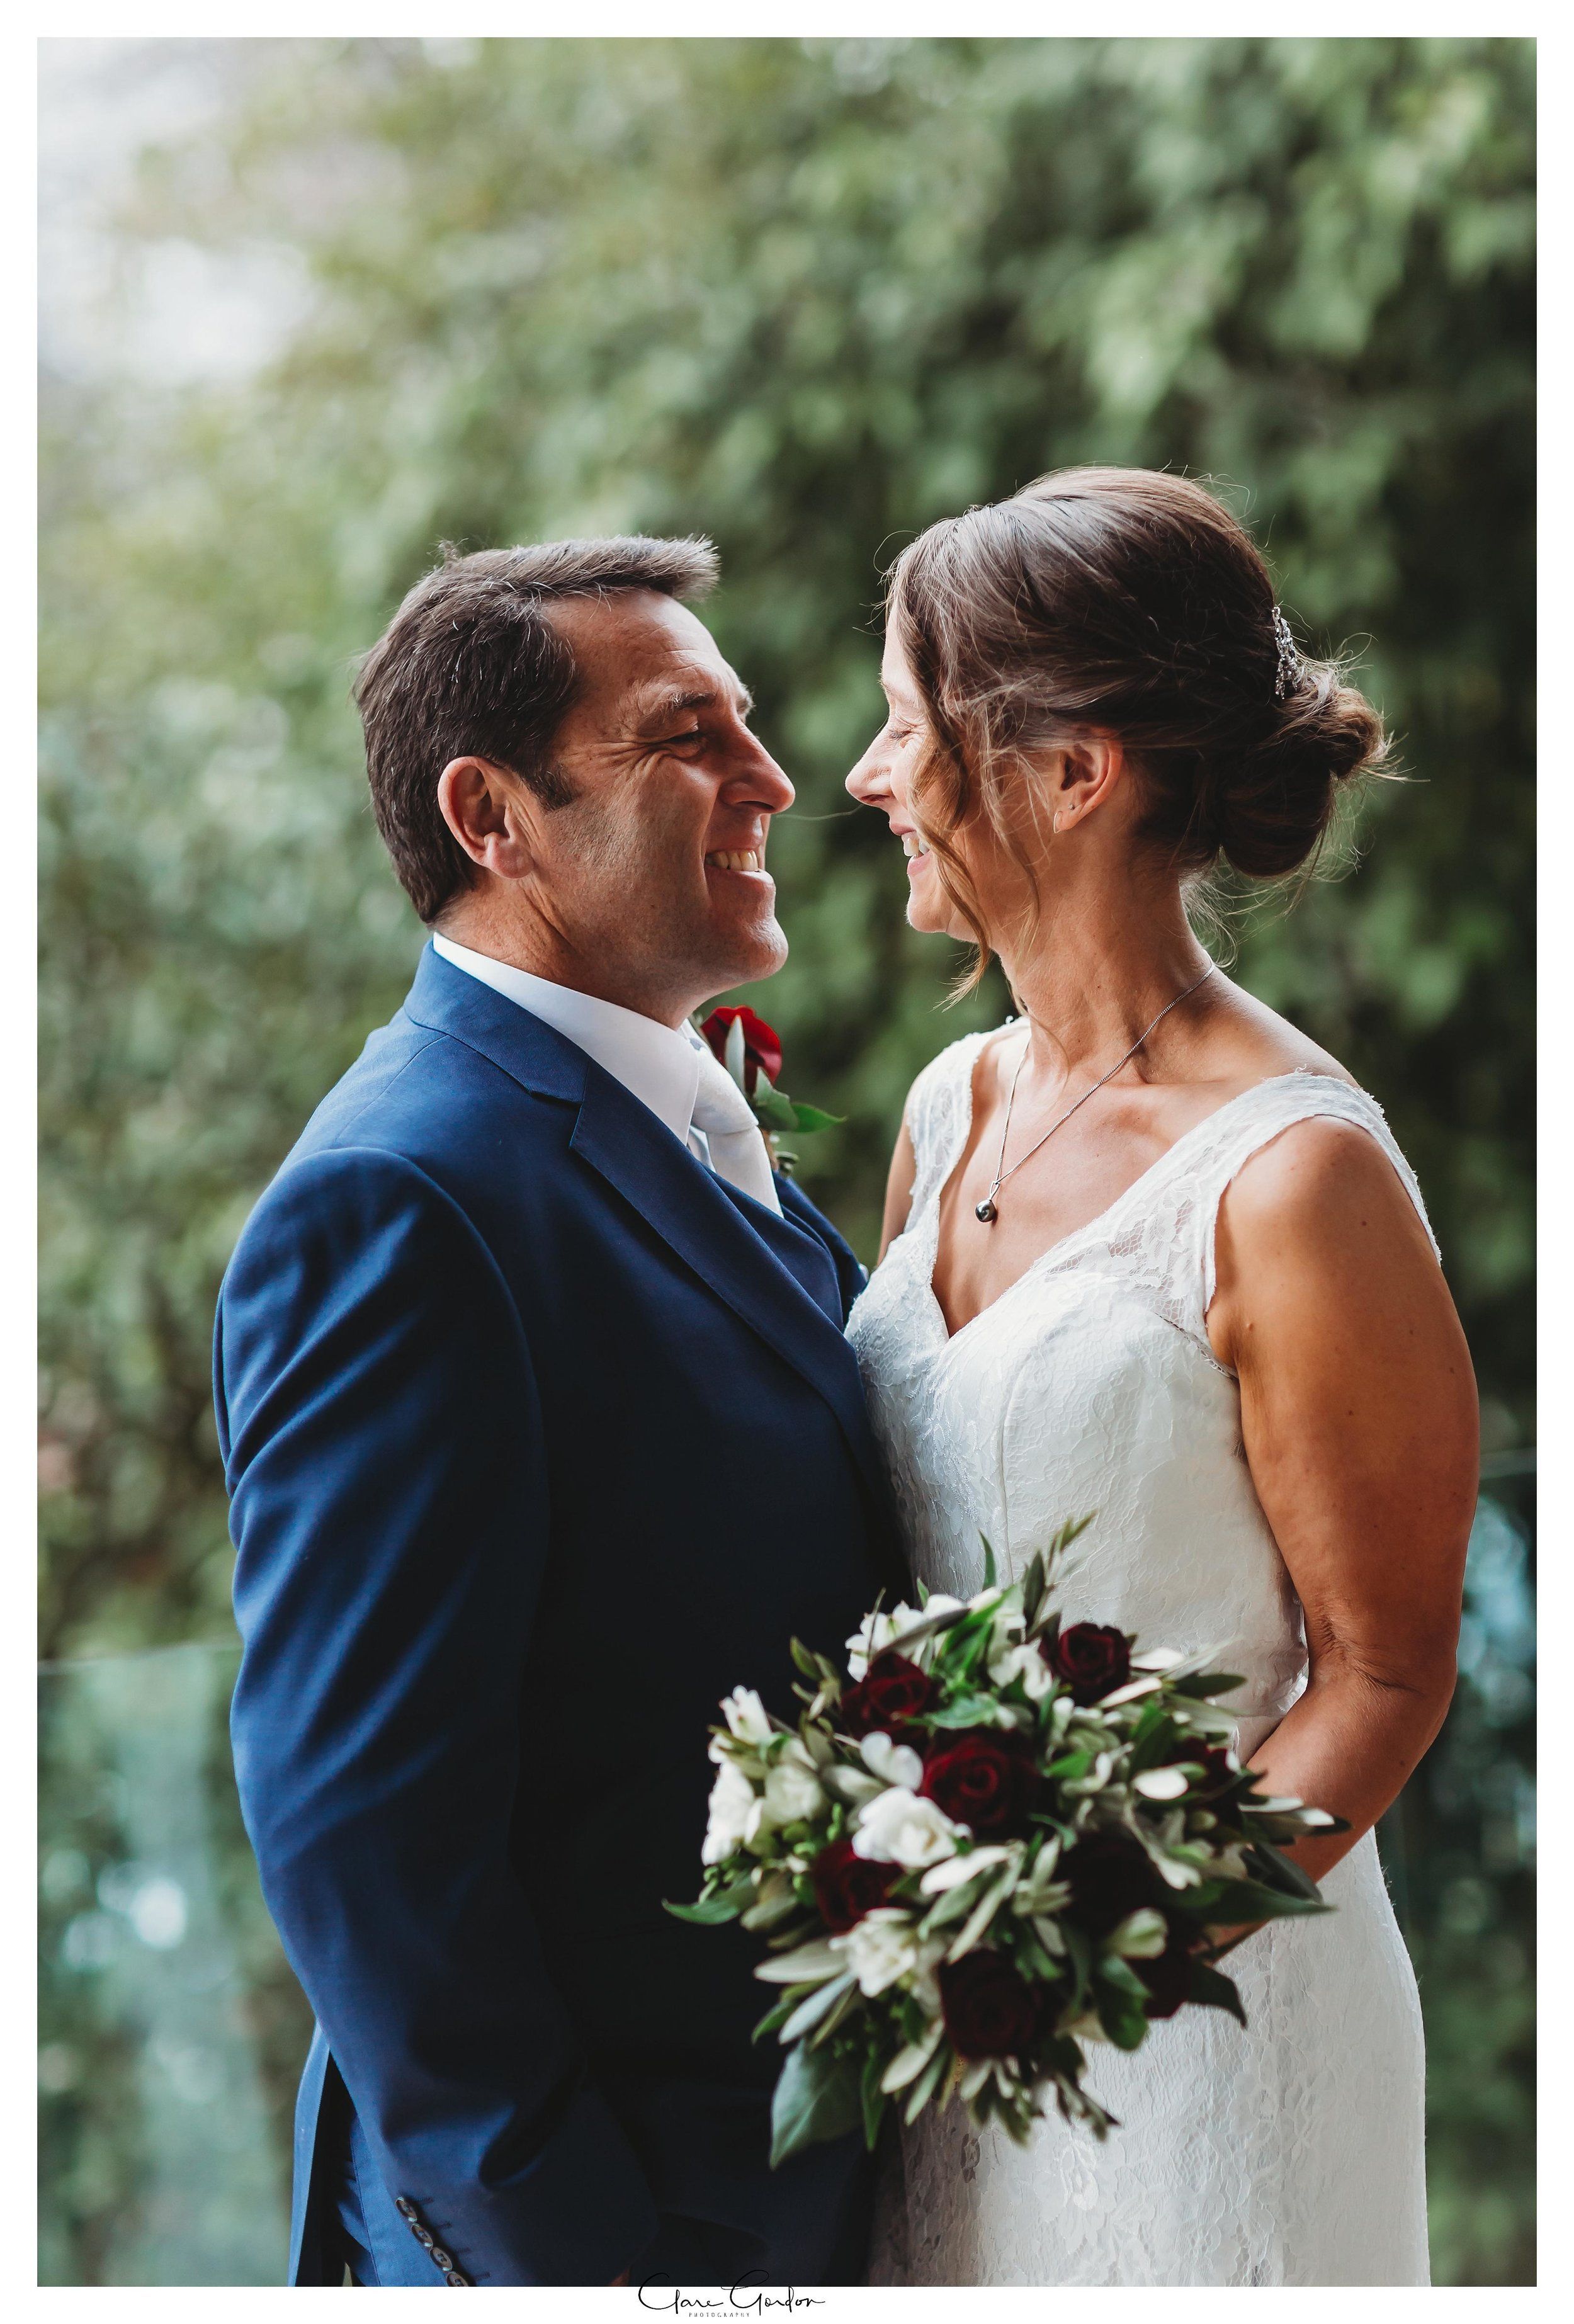 Hamilton-NZ-wedding-photographer-Bride-reflection-Waikato-wedding-photographer-Novotel-Hamilton-Clare-Gordon-photography (22).jpg